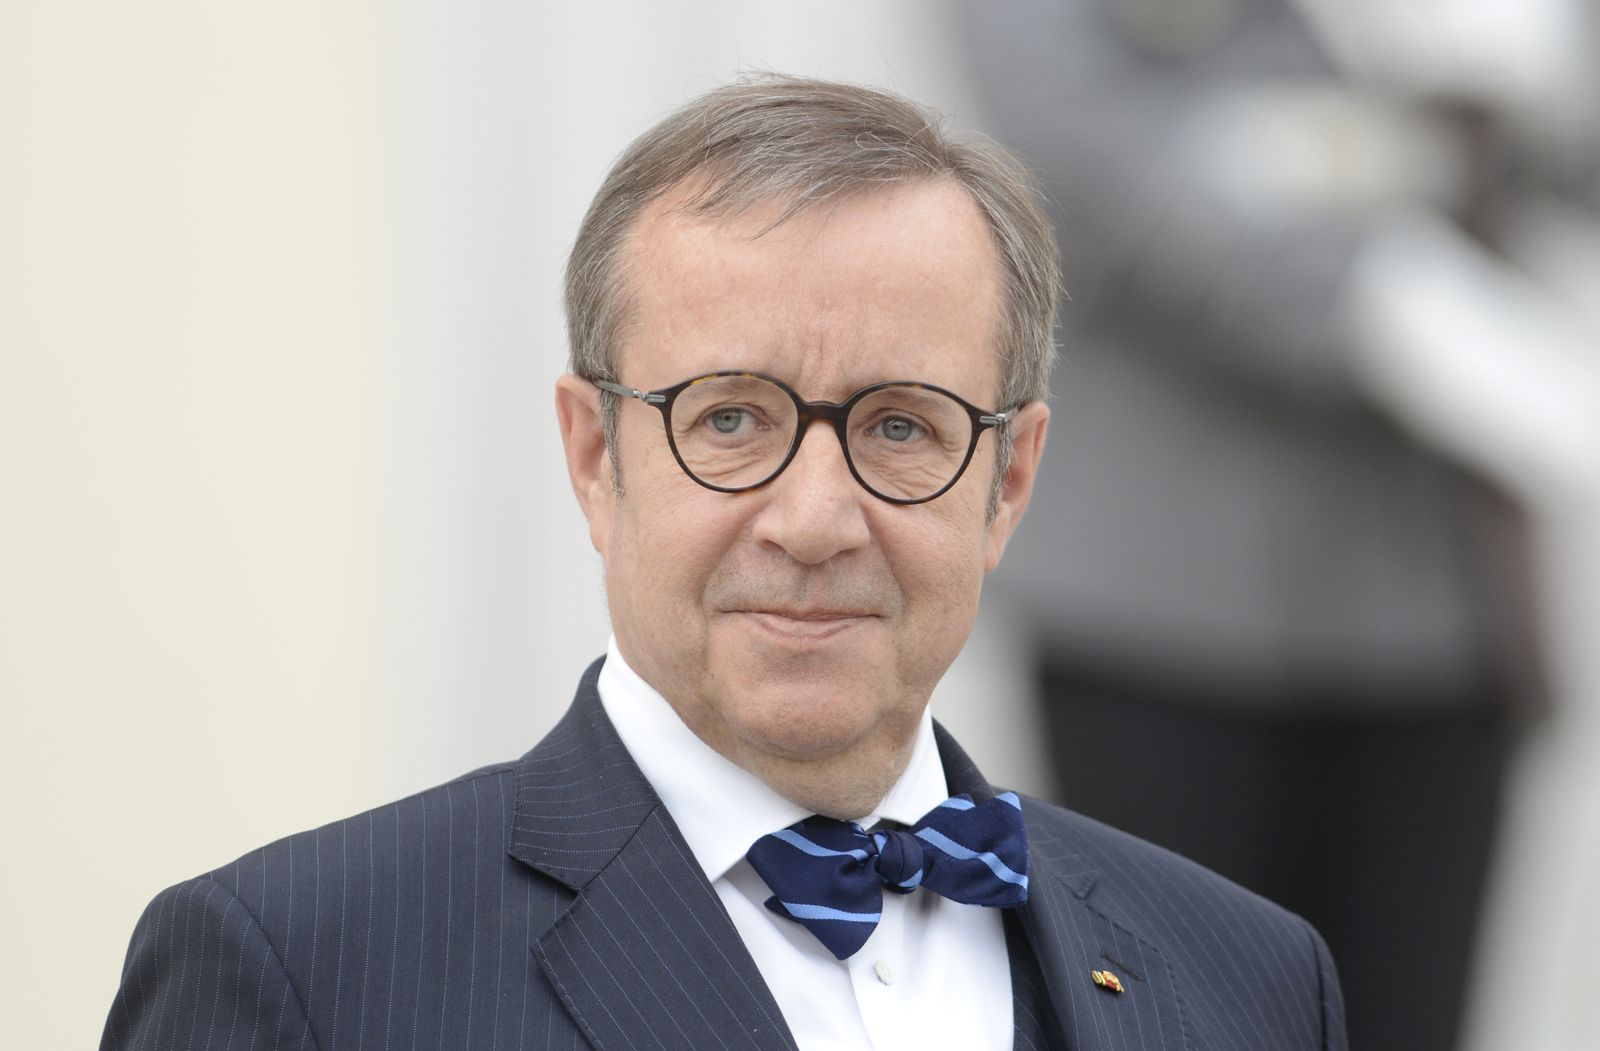 Zerfall Sowjetunion / Toomas Hendrik Ilves / Estland